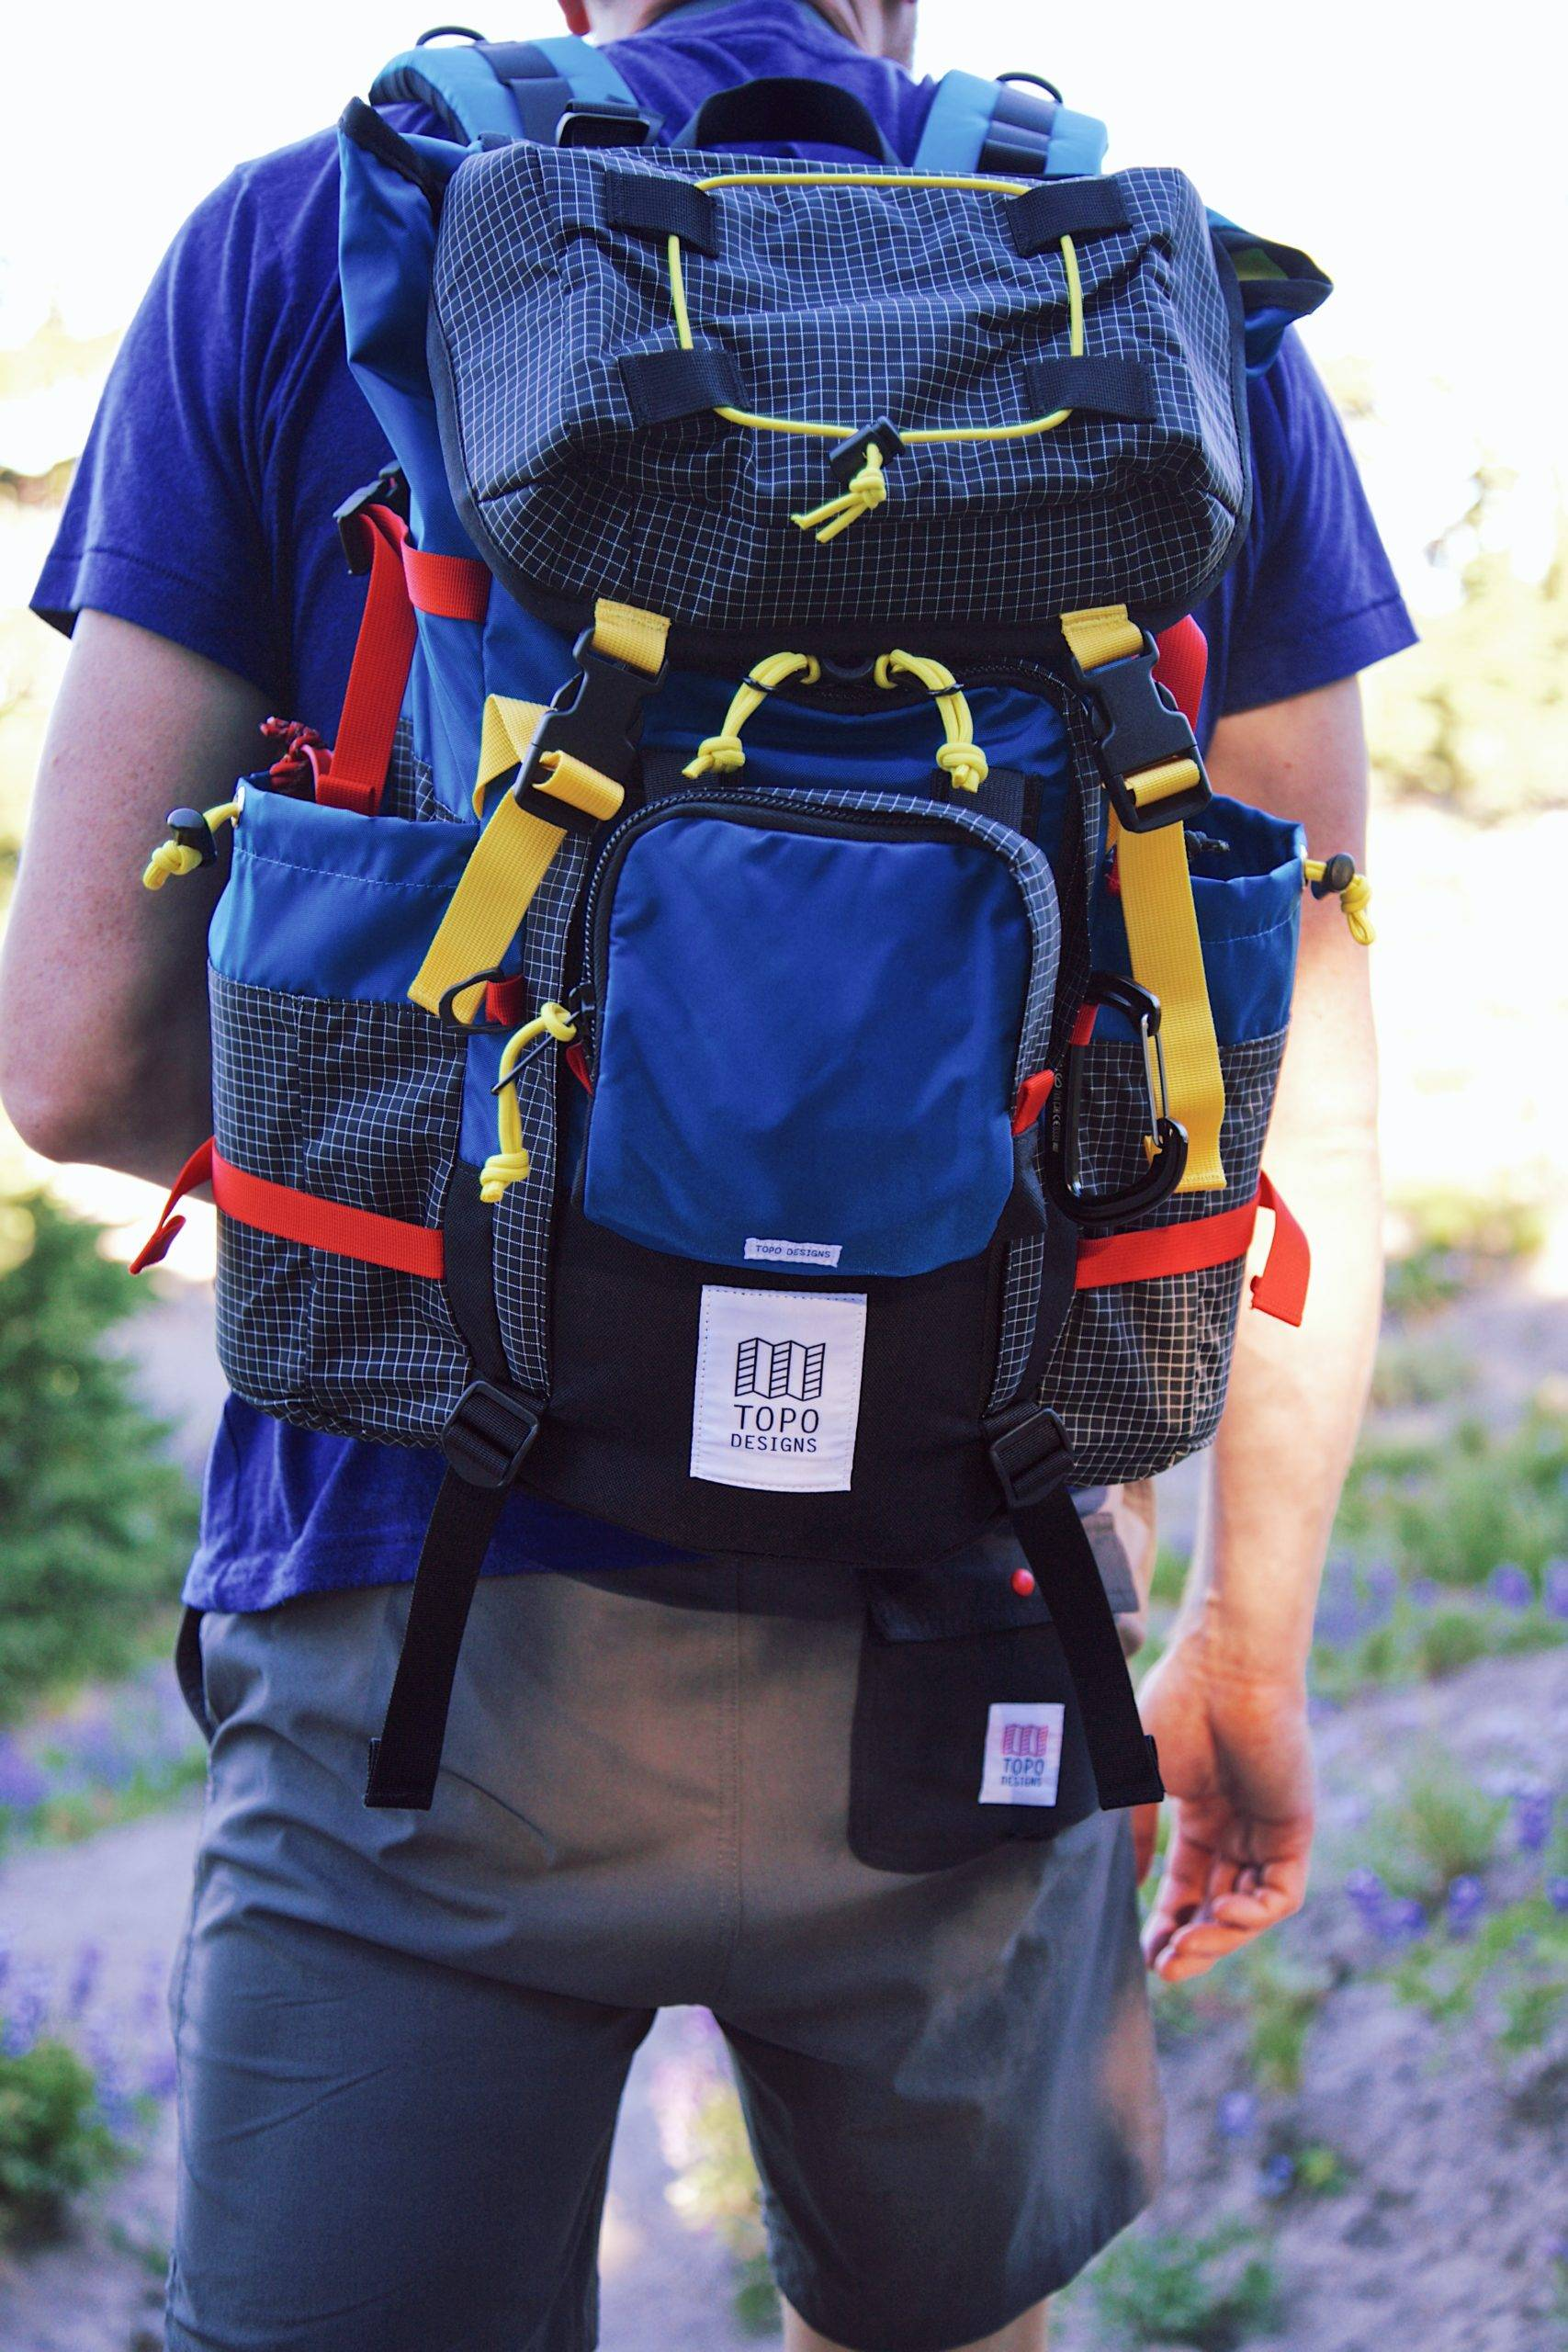 Blue backpack behind a man wearing blue shirt